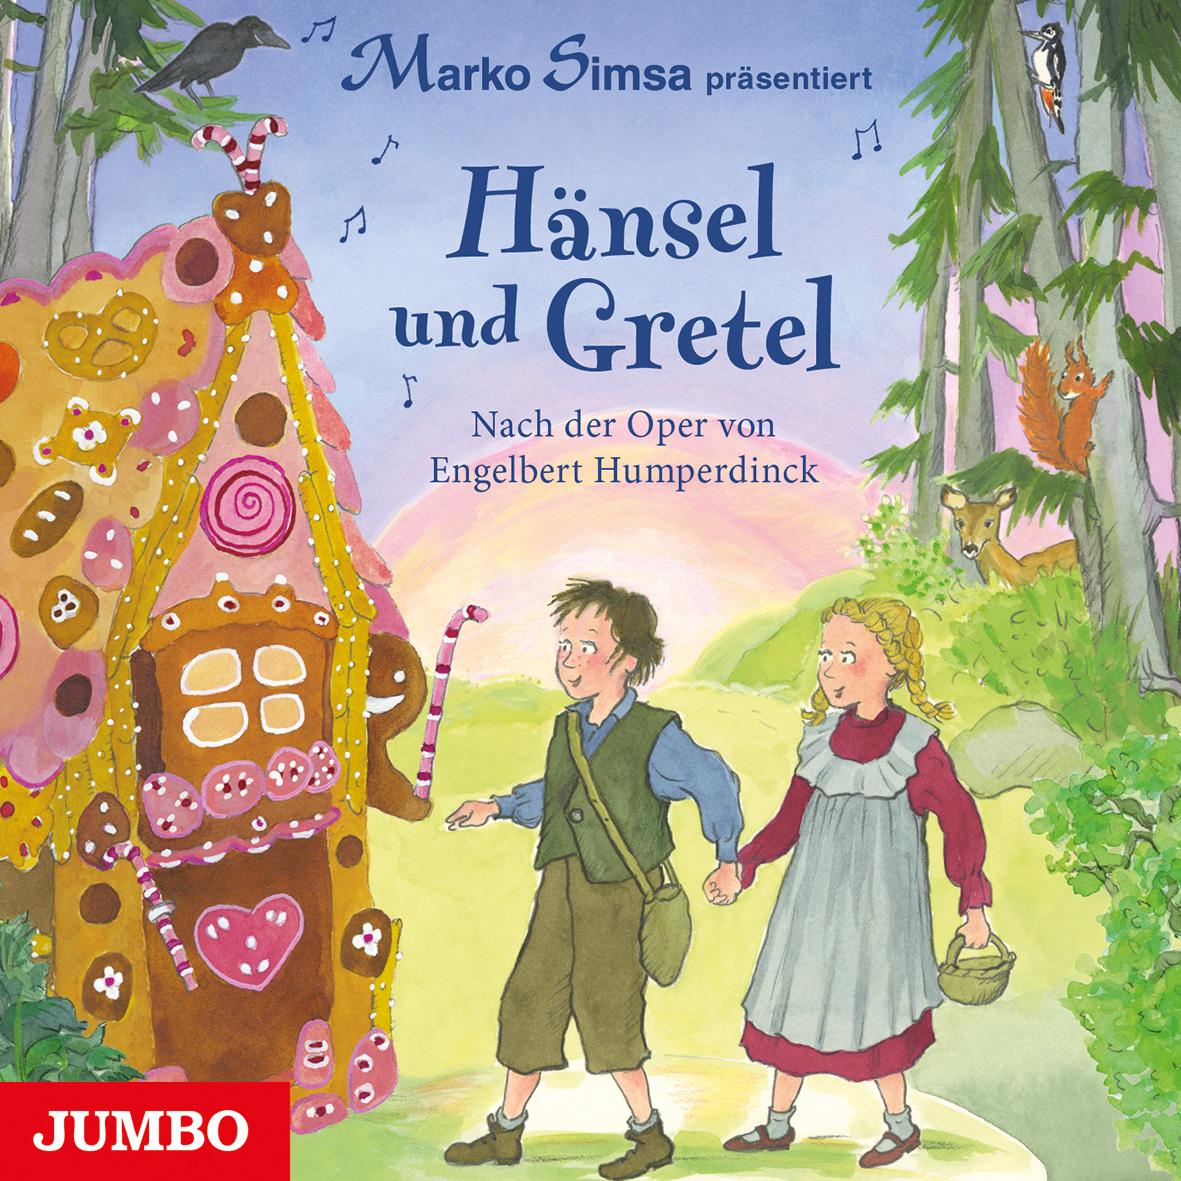 Hänsel und Gretel, Marko Simsa